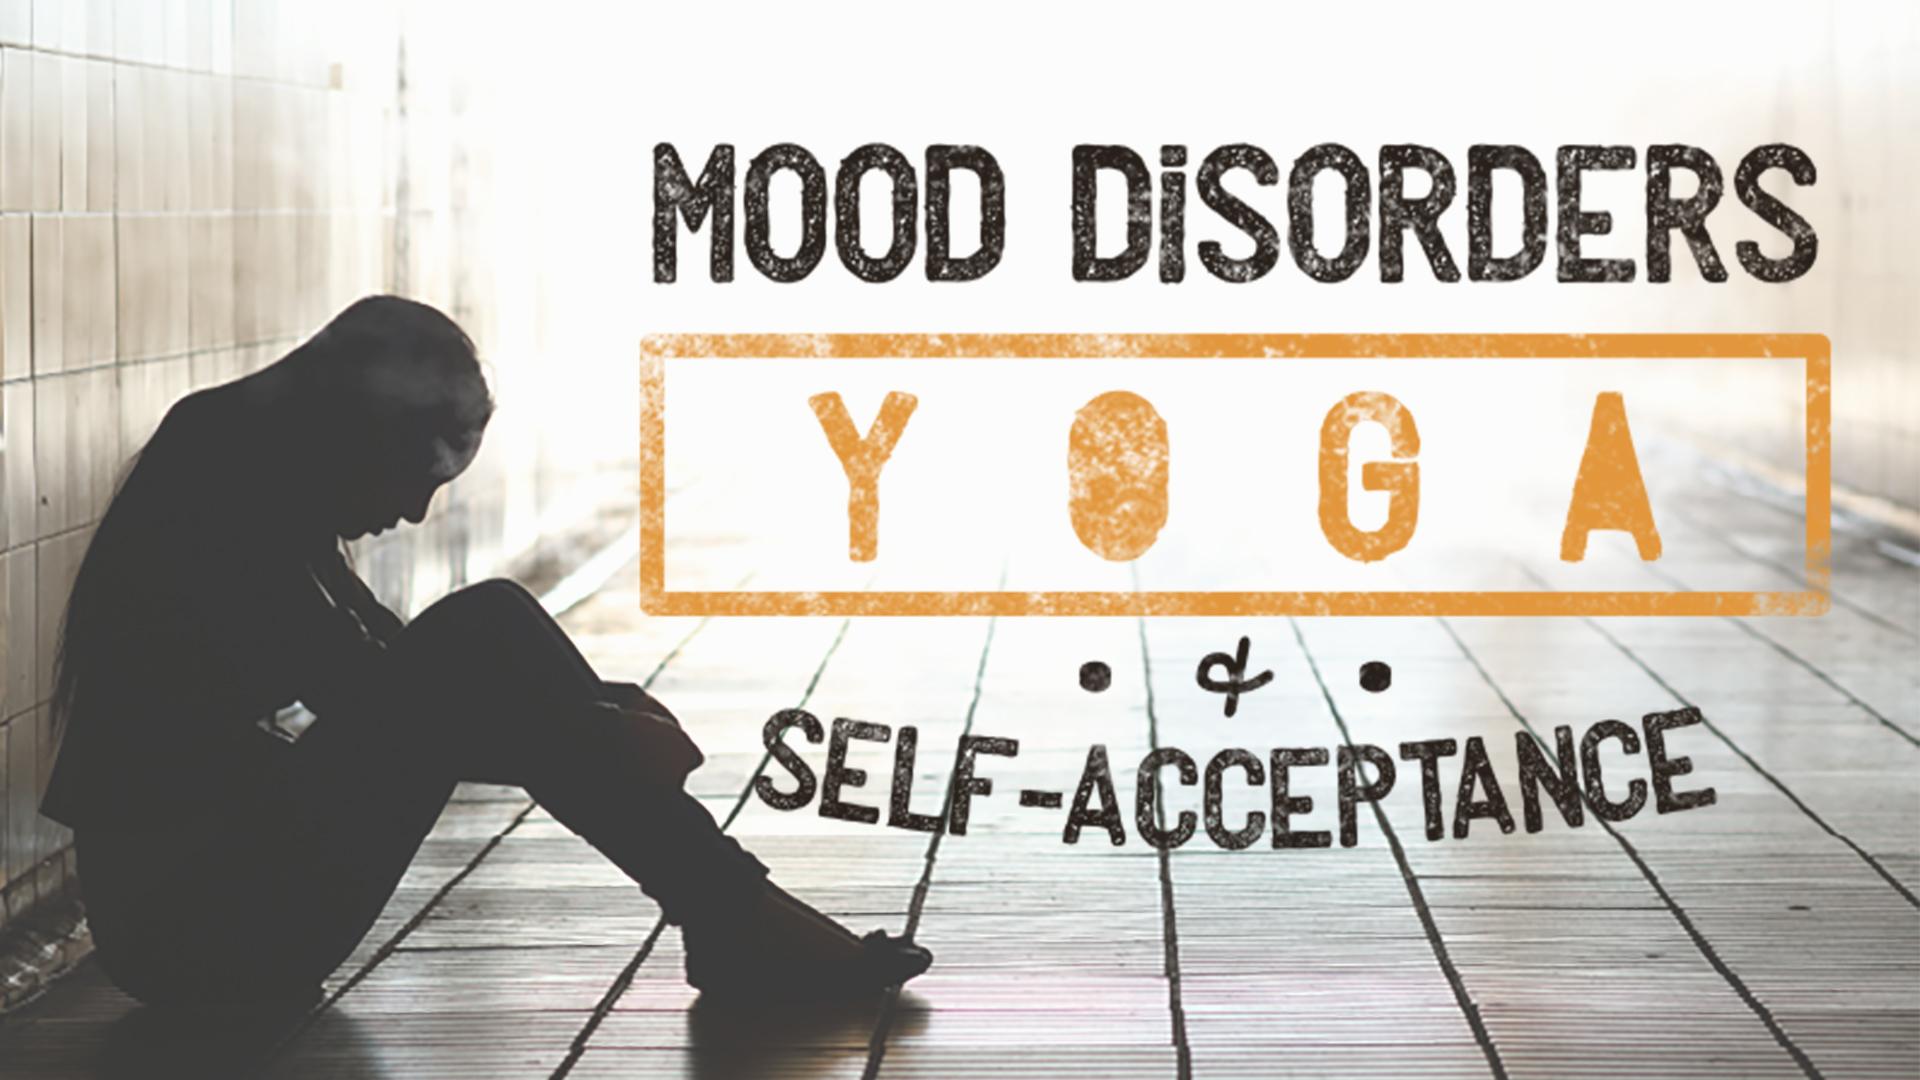 Mood Disorders, Yoga, and Self-Acceptance